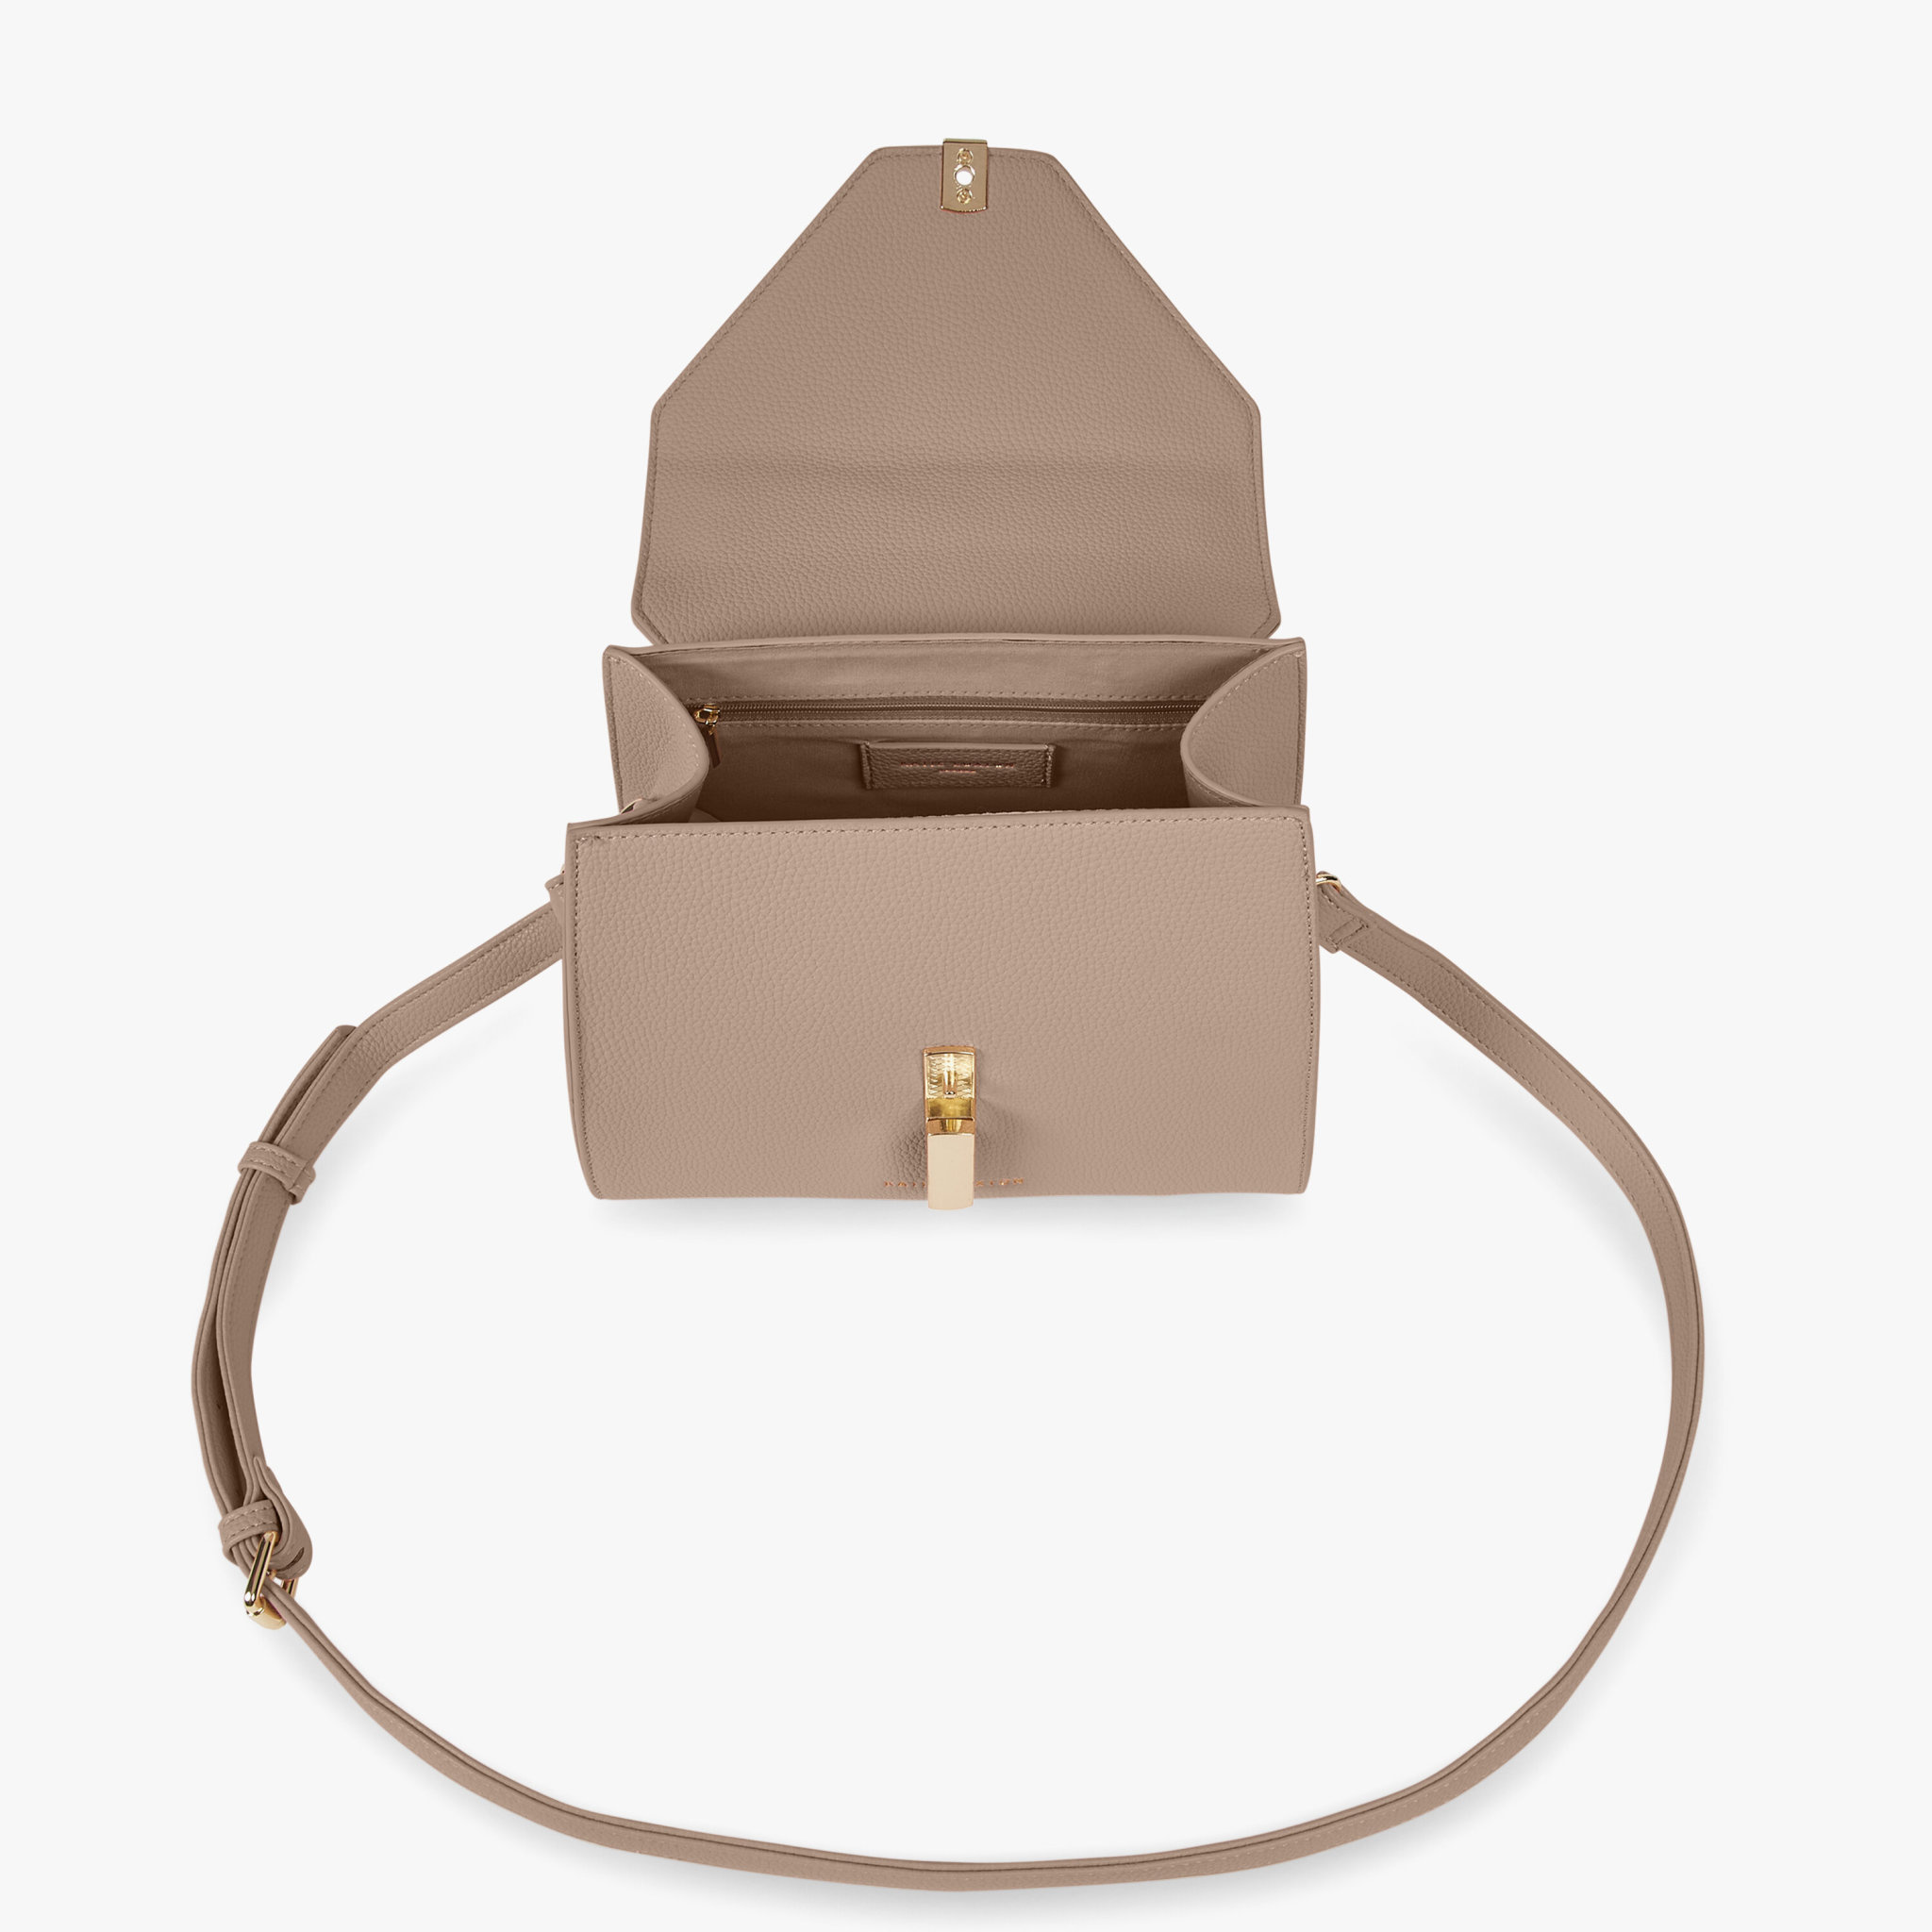 Katie Loxton Katie Loxton Casey top handle bag - Sand  & mint green - 19 x 24 x 13 cm